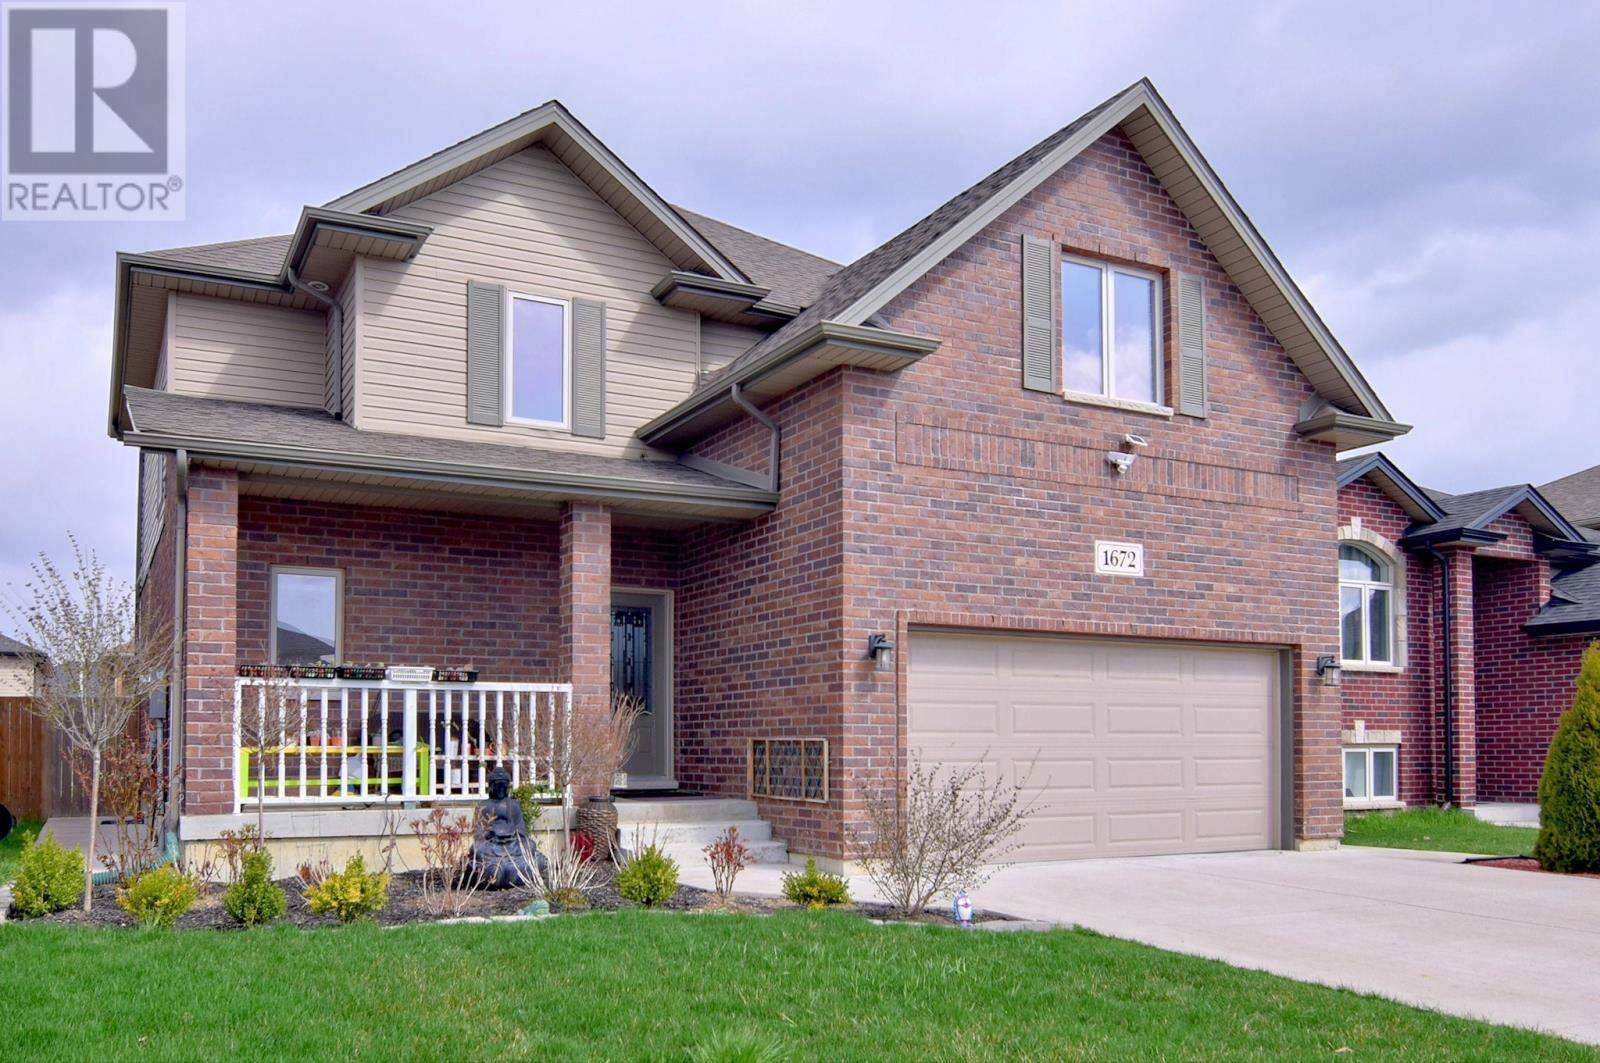 House for sale at 1672 Kenora  Windsor Ontario - MLS: 20004275